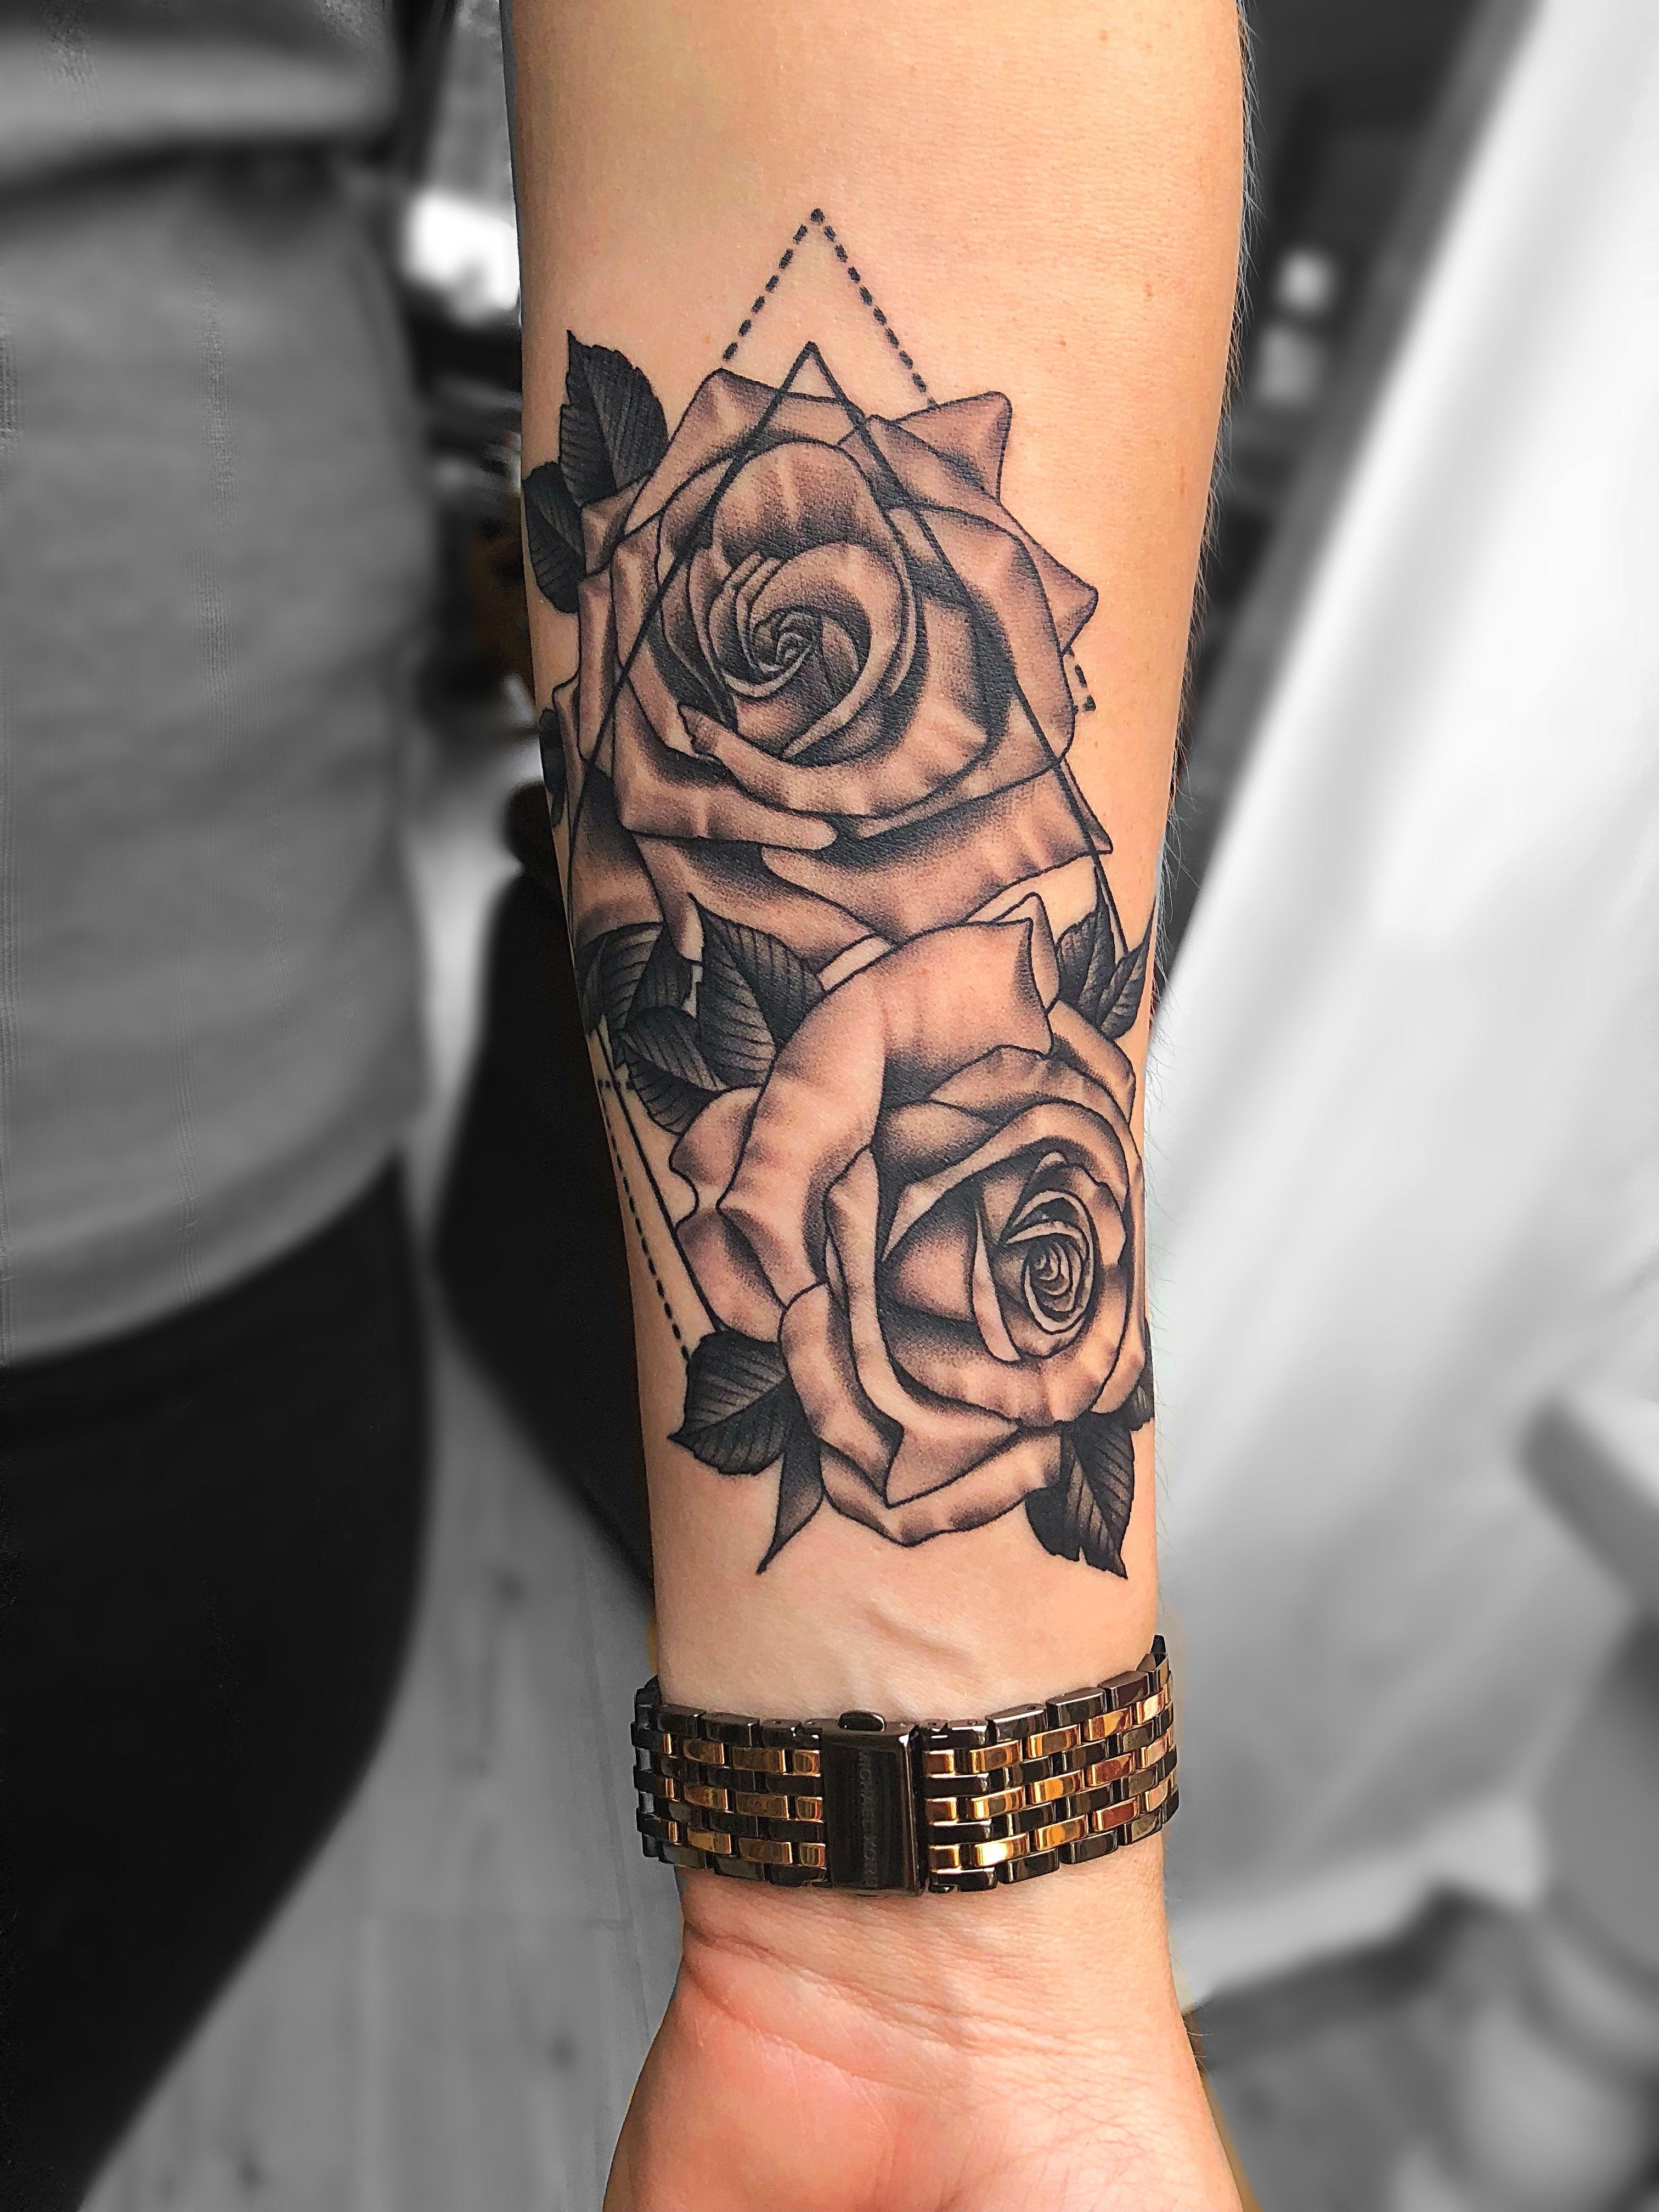 Roses Tattoos Arm : roses, tattoos, Roses, Forearm, Tattoo, Women,, Design,, Tattoos